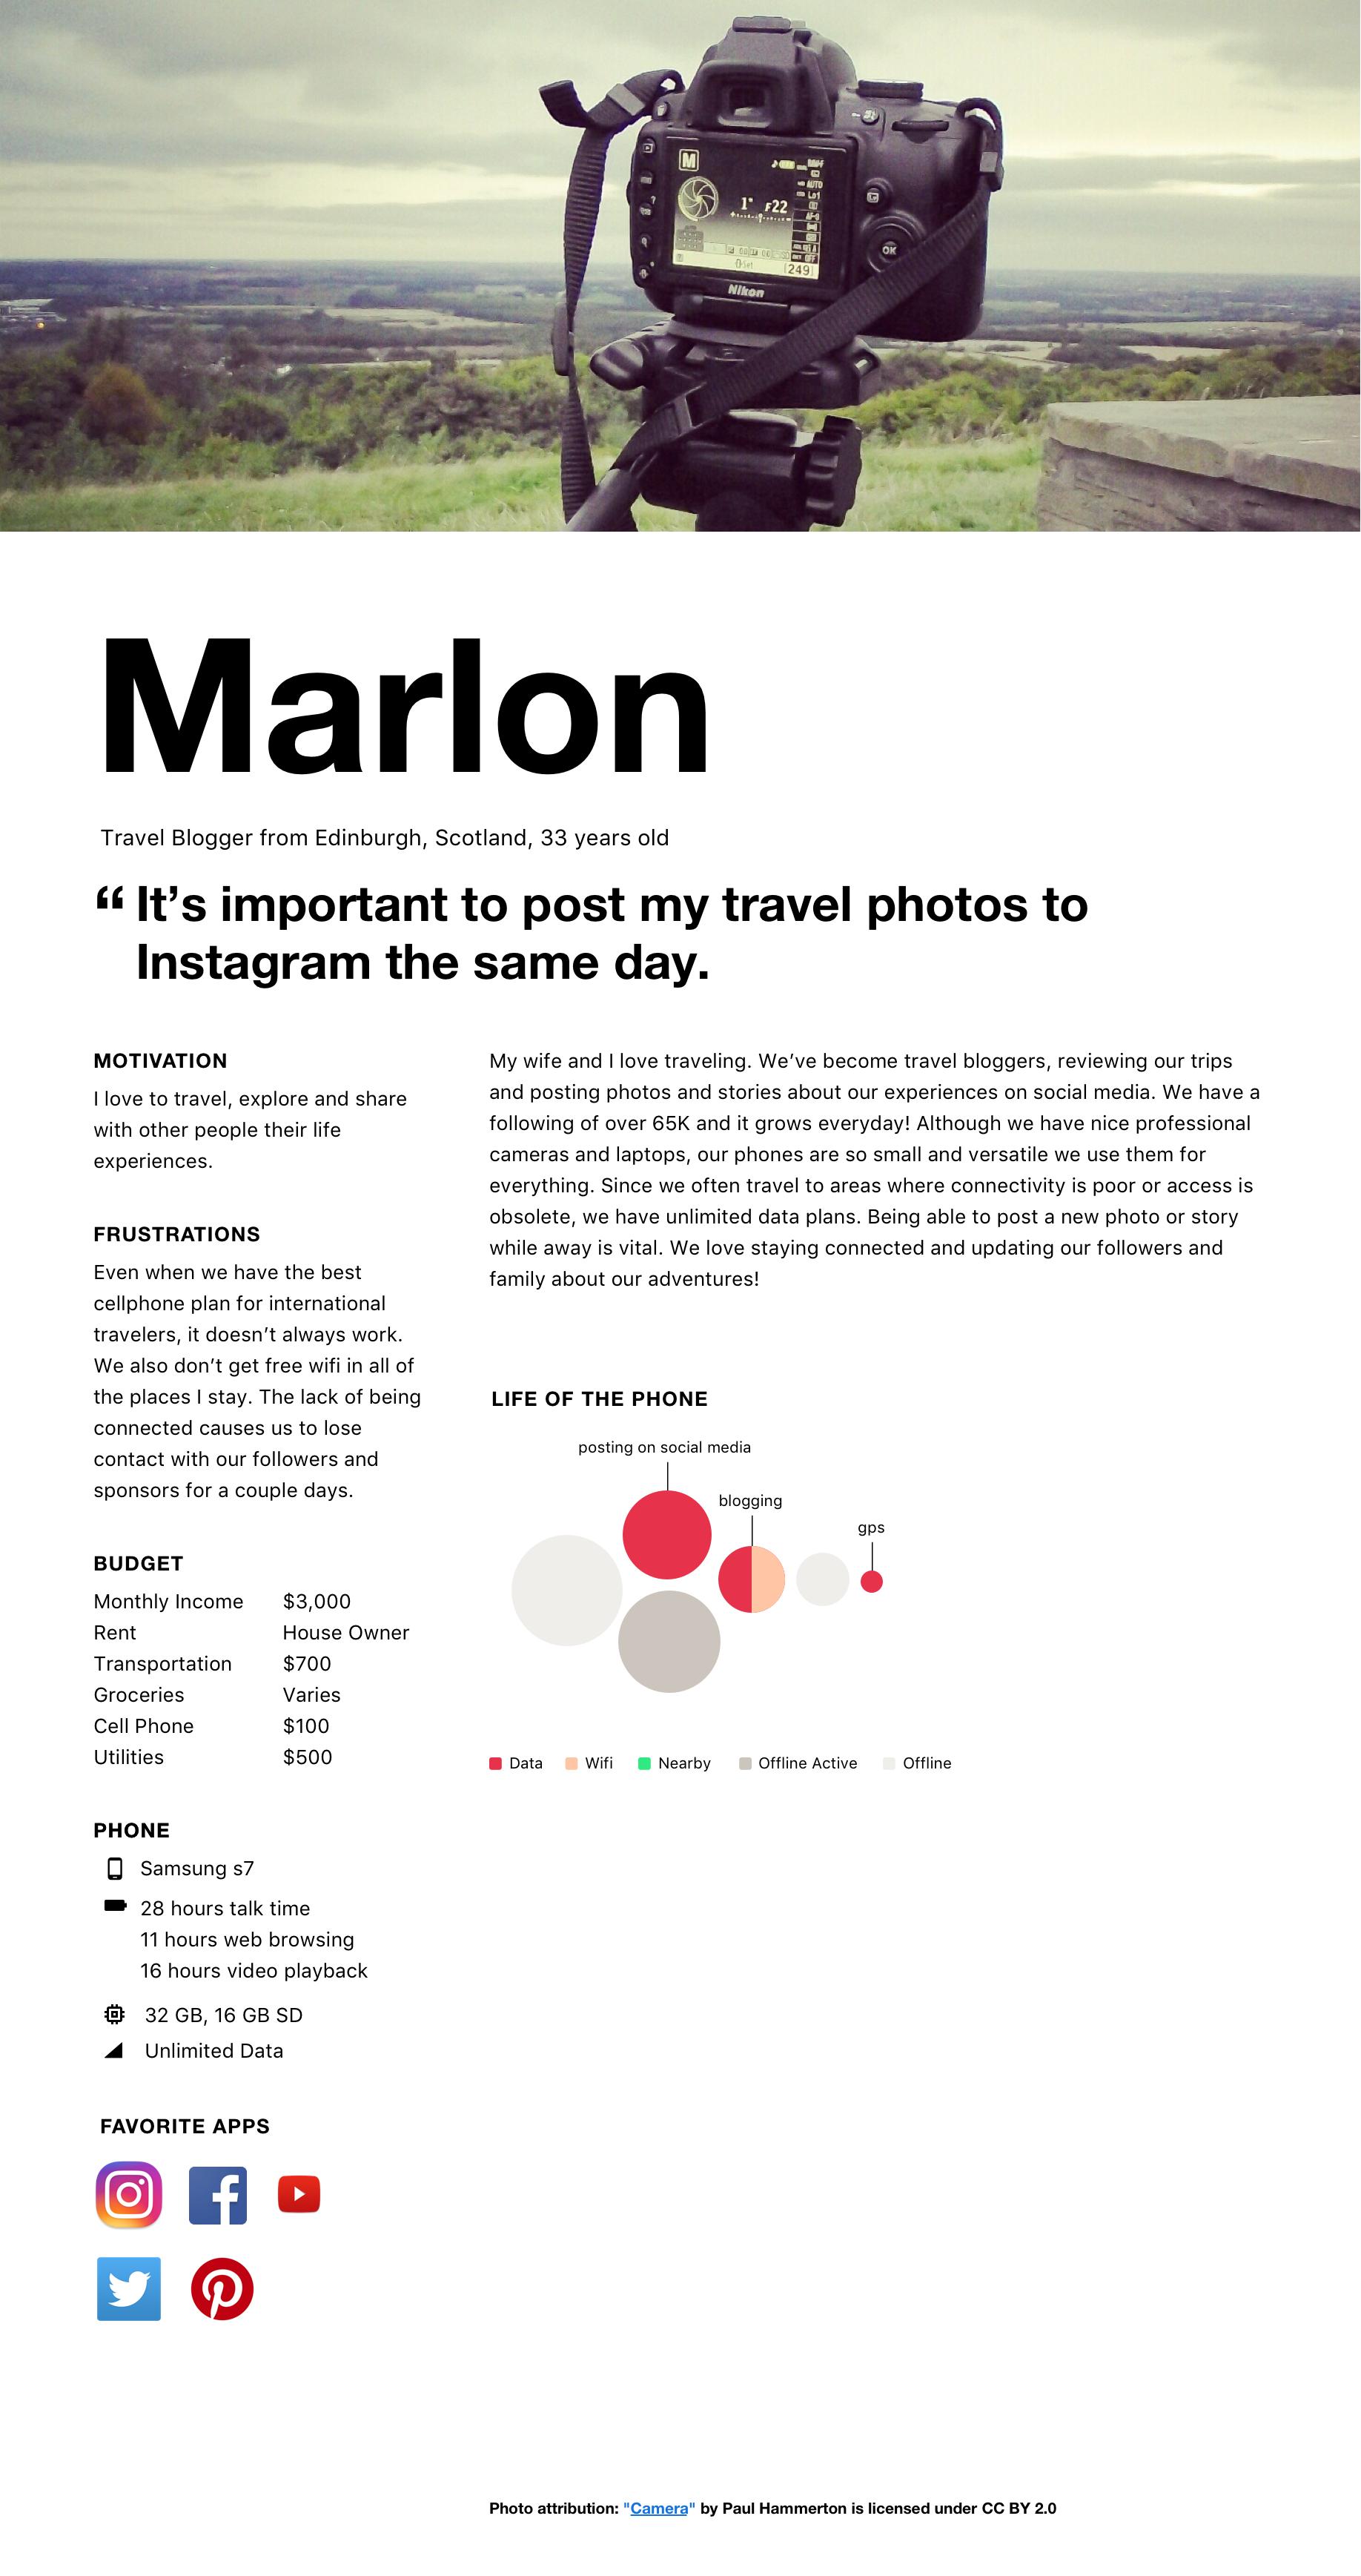 ux-persona-tourist-Marlon@3x.png